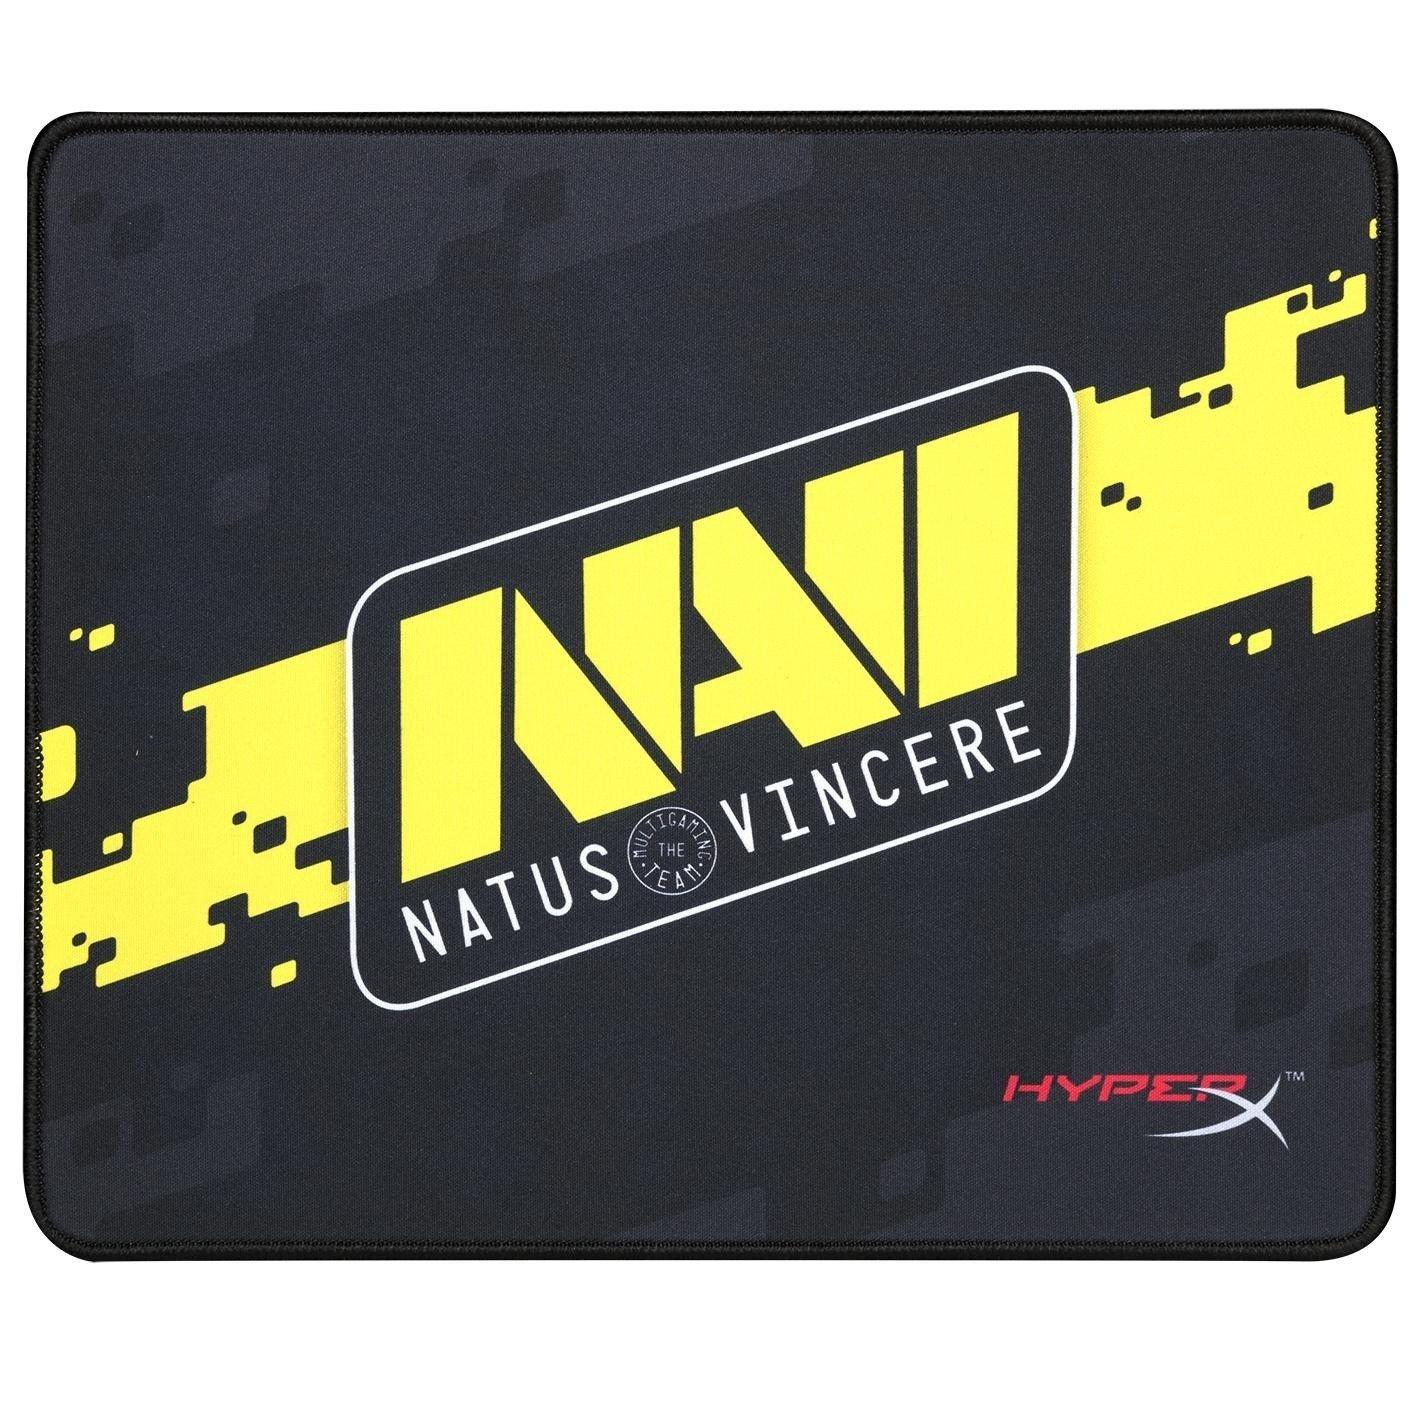 Ігрова поверхня HyperX FURY S Pro Gaming Mouse Pad Medium NEW (HX-MPFS-M-1N) фото